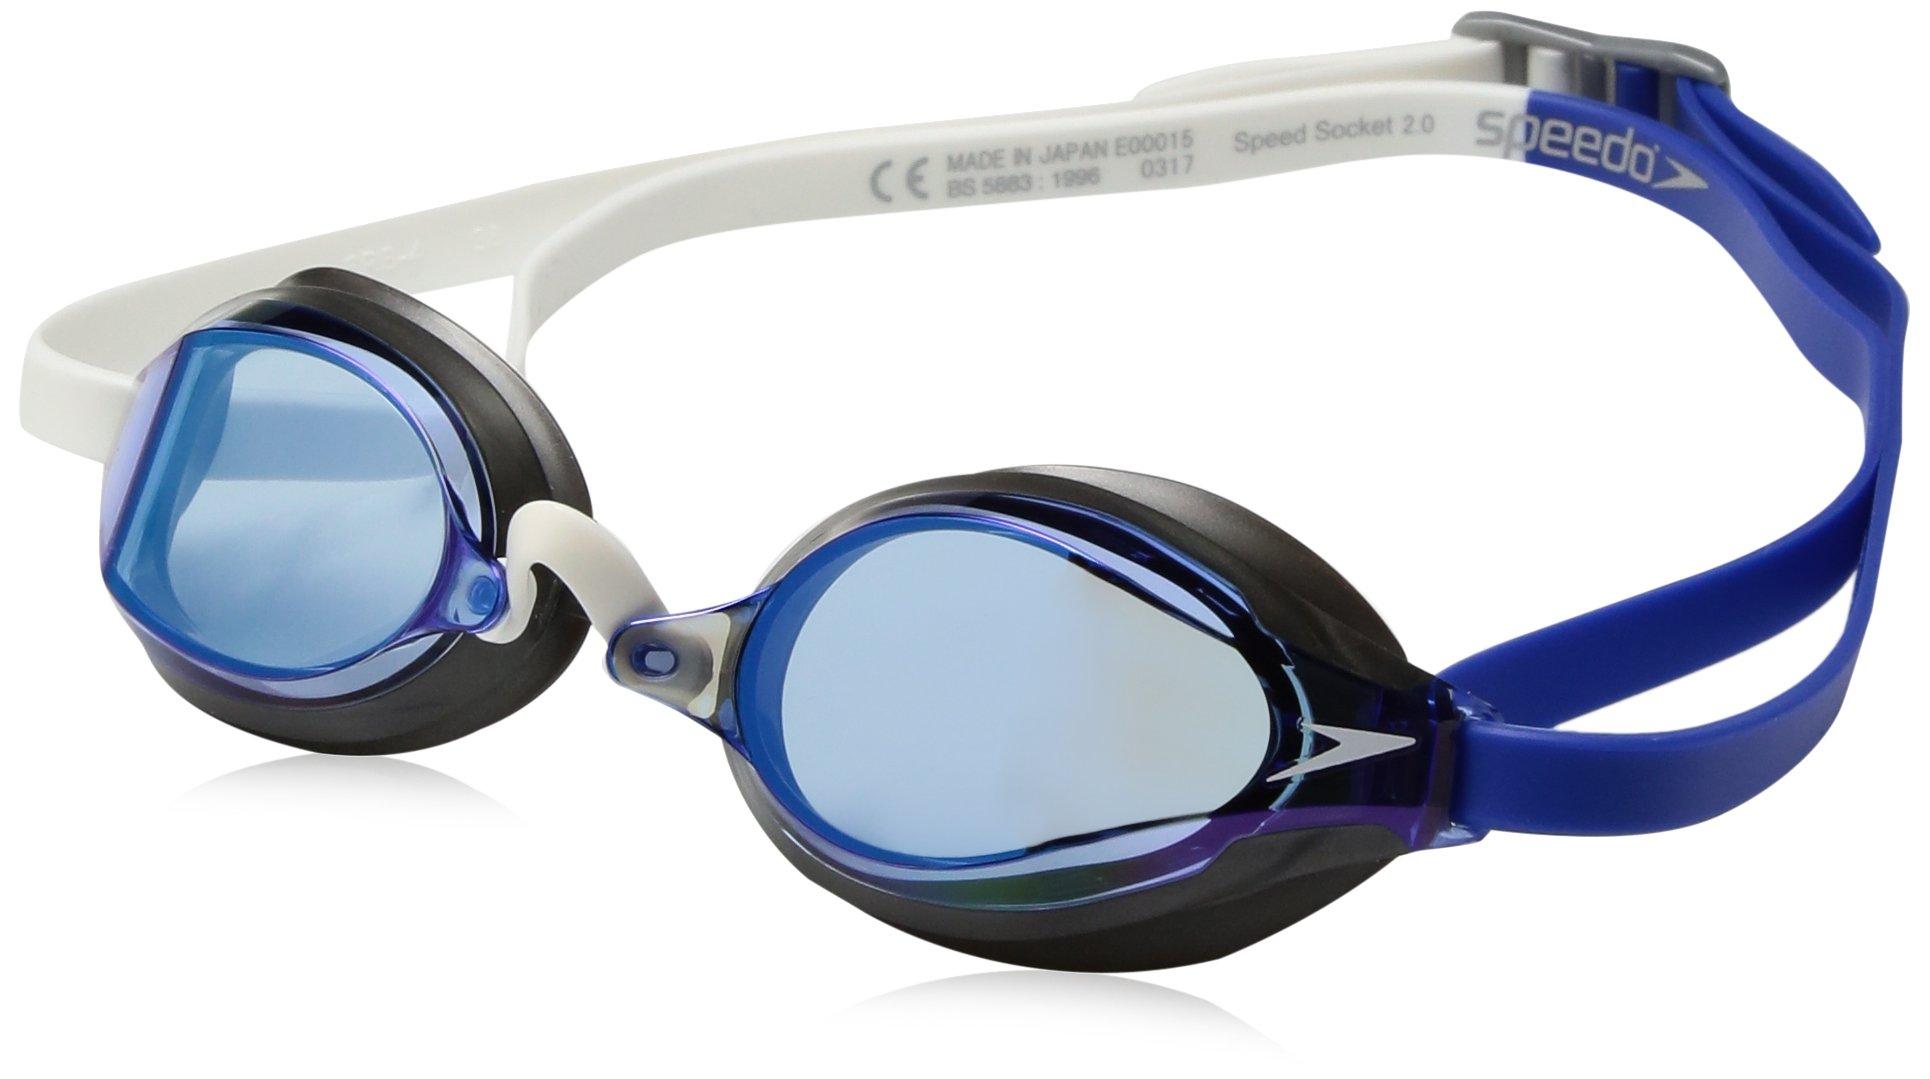 Speedo Speed Socket 2.0 Mirrored Swim Goggles, Curved, Anti-Glare, Anti-Fog with UV Protection, Dazzling Blue, 1SZ